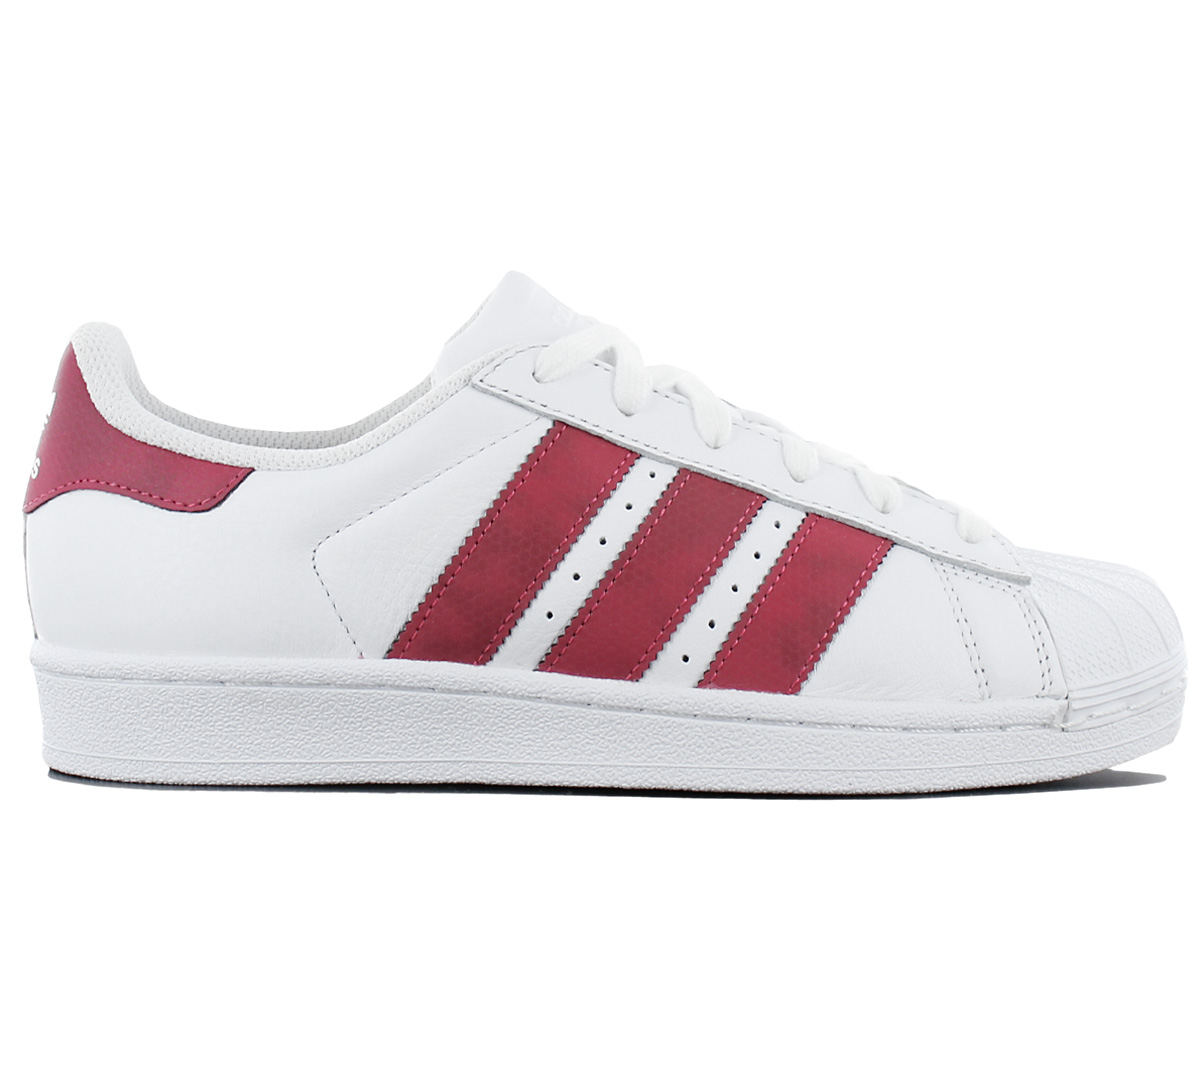 Details about Adidas Superstar 2 Sneaker